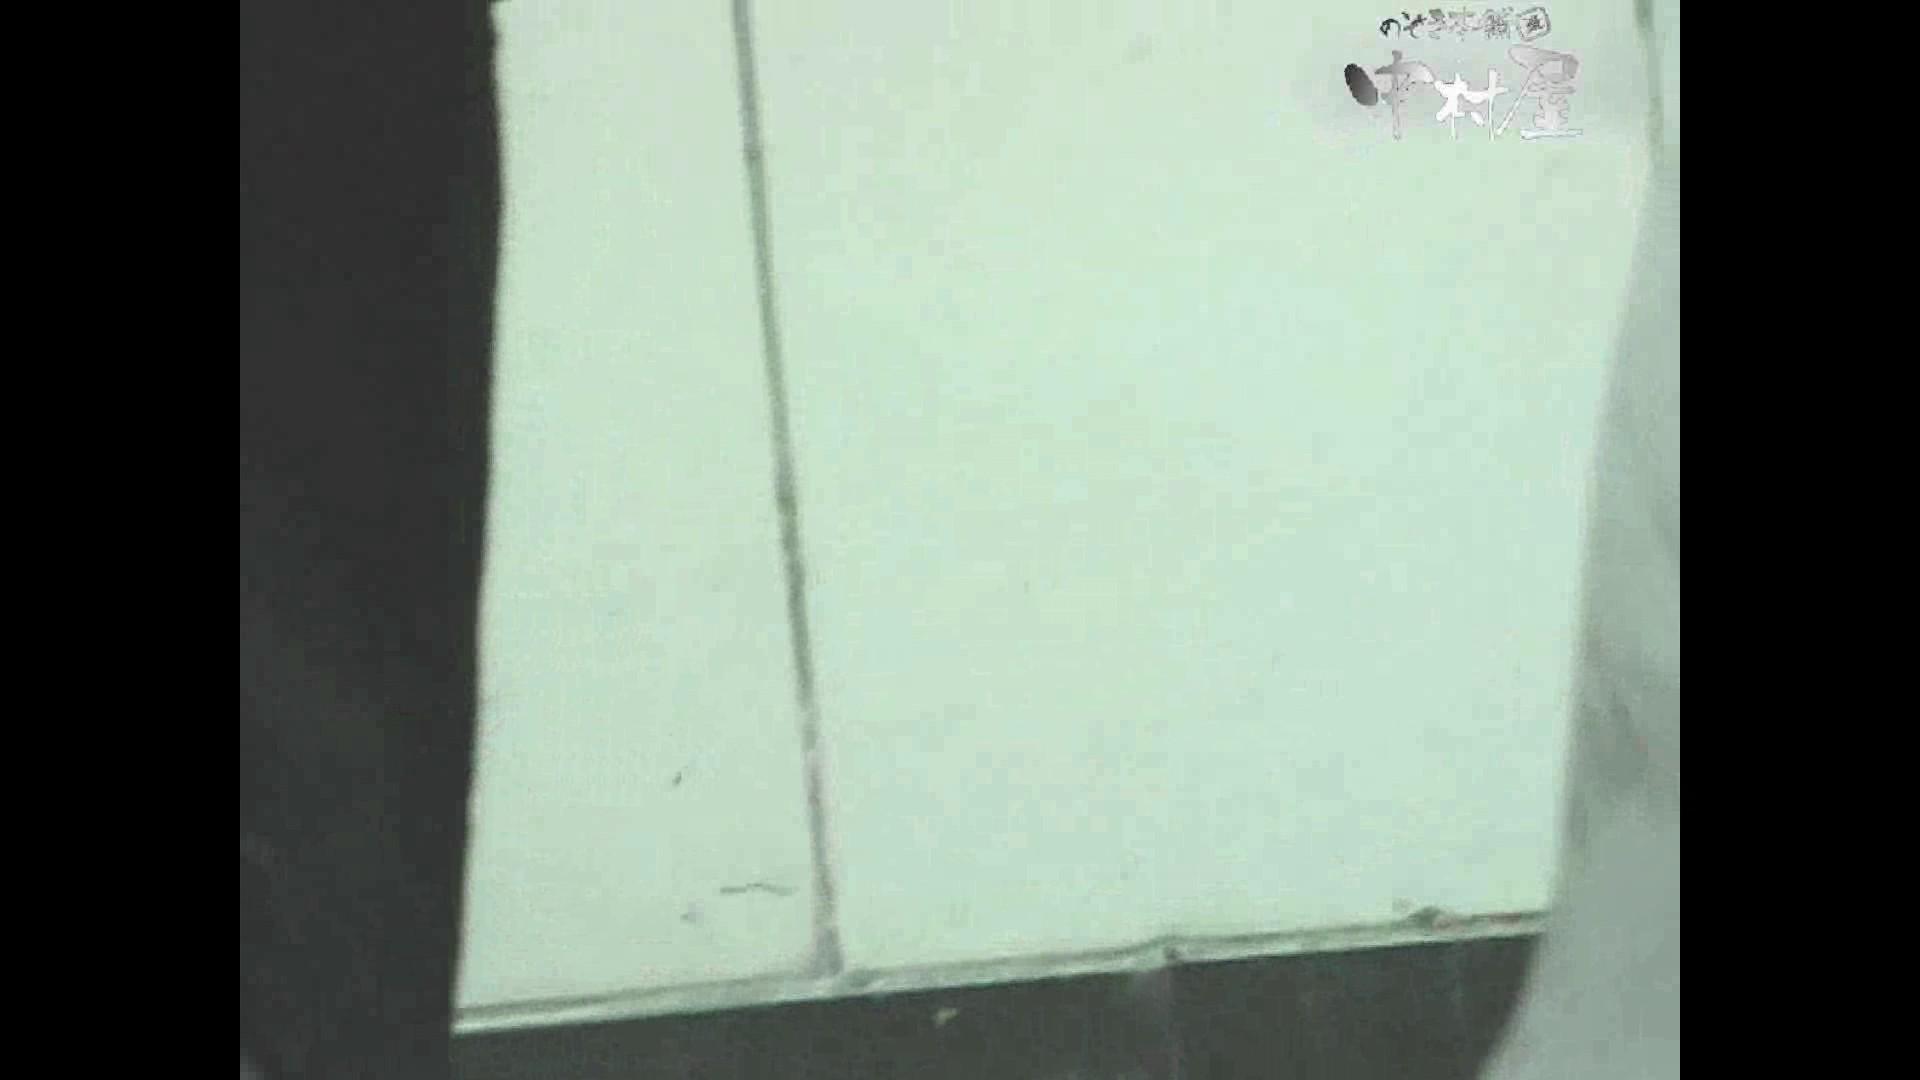 岩手県在住盗撮師盗撮記録vol.42 厠 隠し撮りオマンコ動画紹介 66連発 43